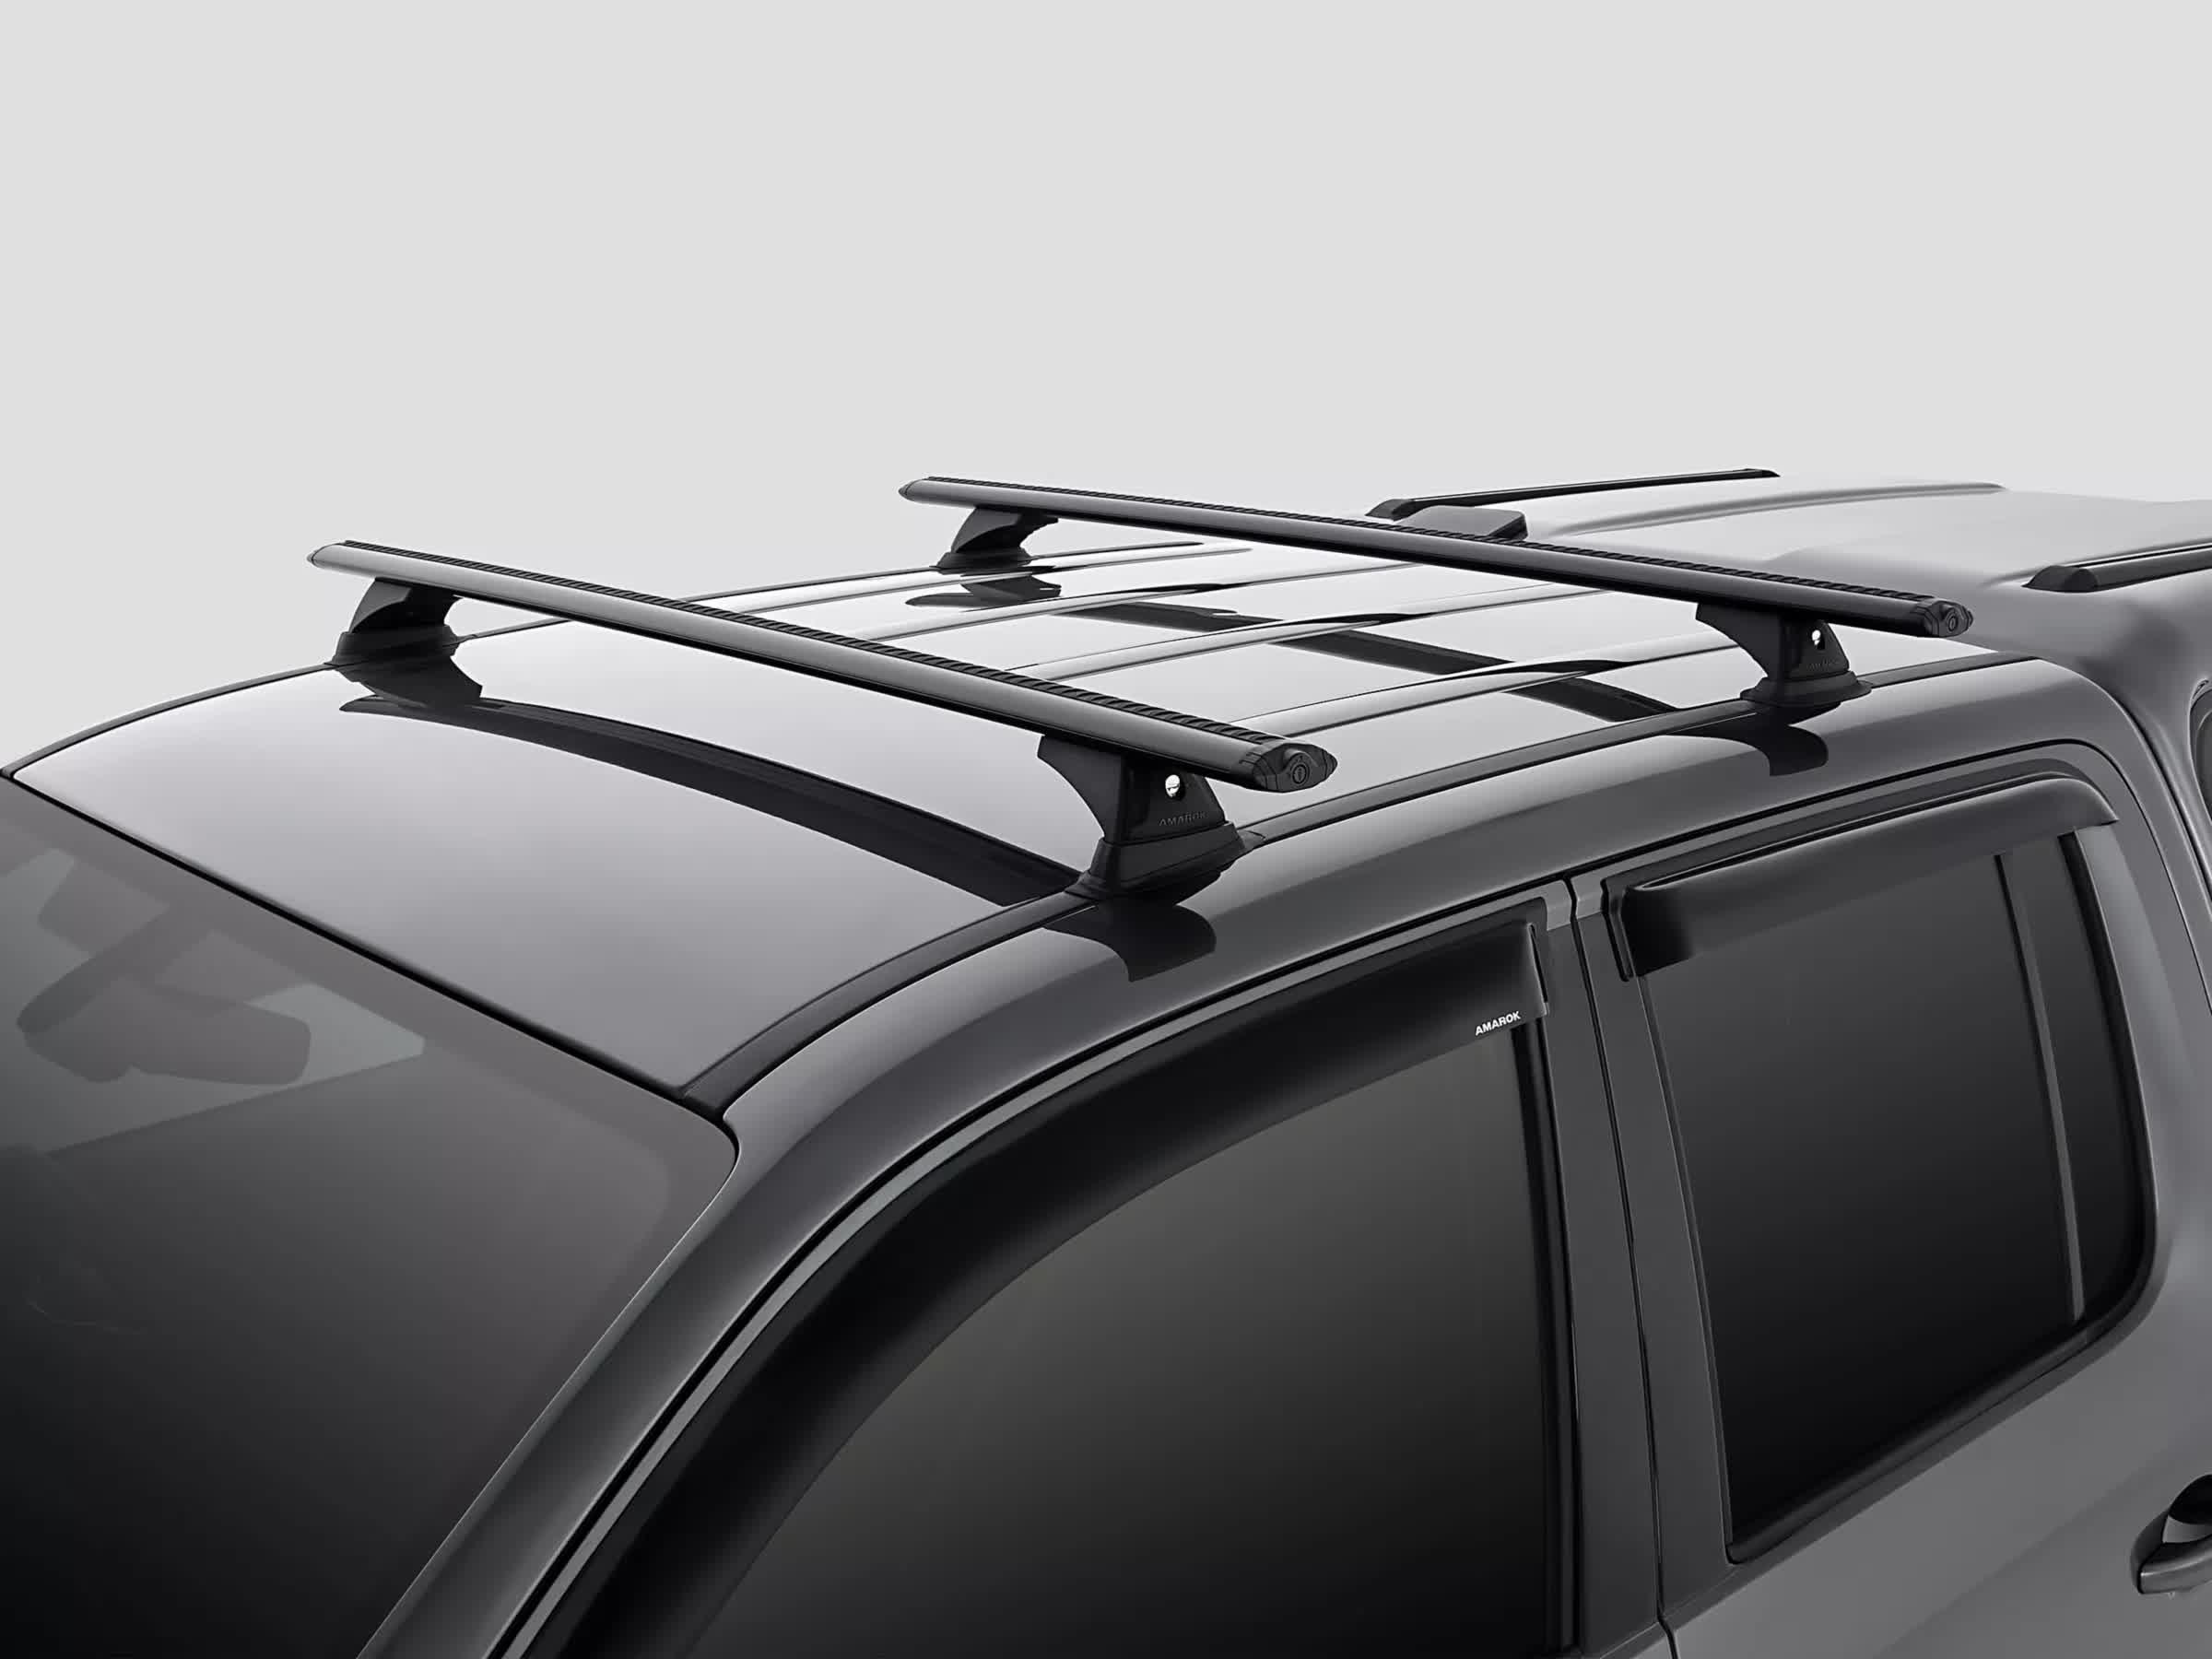 Roof racks, commercial